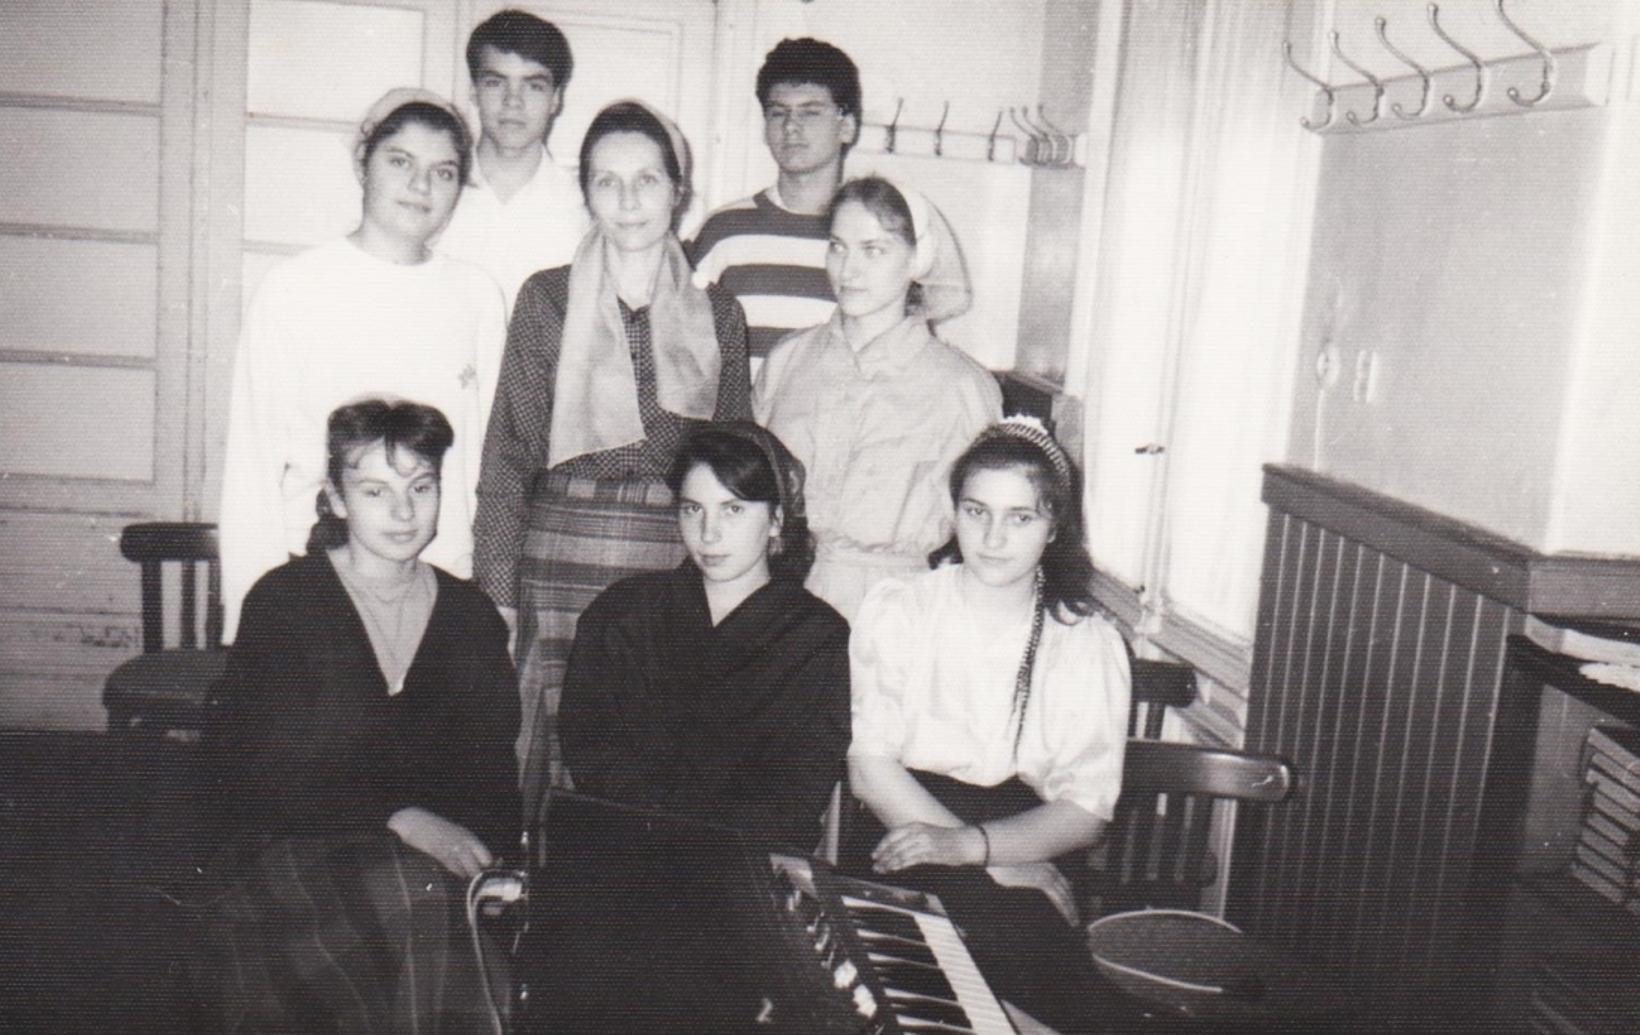 TINERI DIN VECHEA BISERICA CRESTINA DUPA EVANGHELIE DRAGOS VODA BUCURESTI 1990